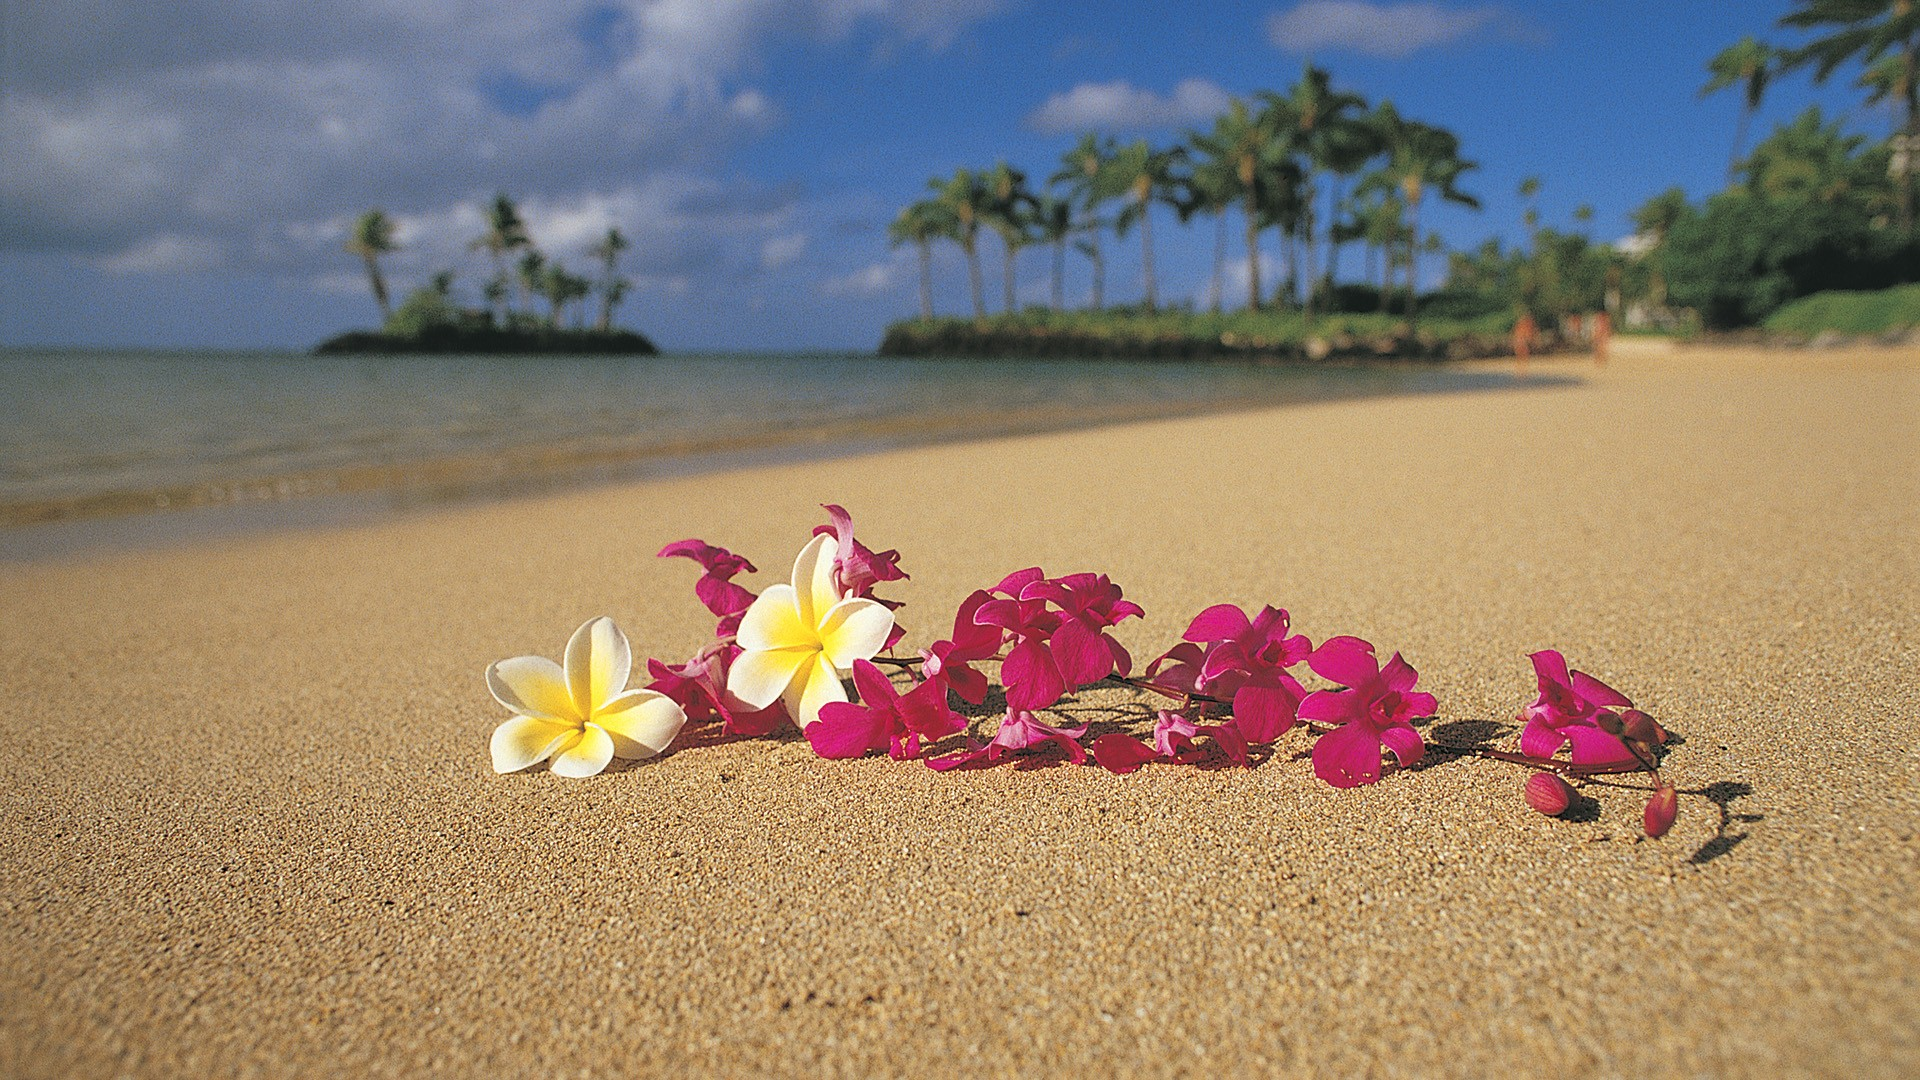 Beach Sand Flowers Hawaii Palm Trees Oahu Pink Plumeria Wallpaper